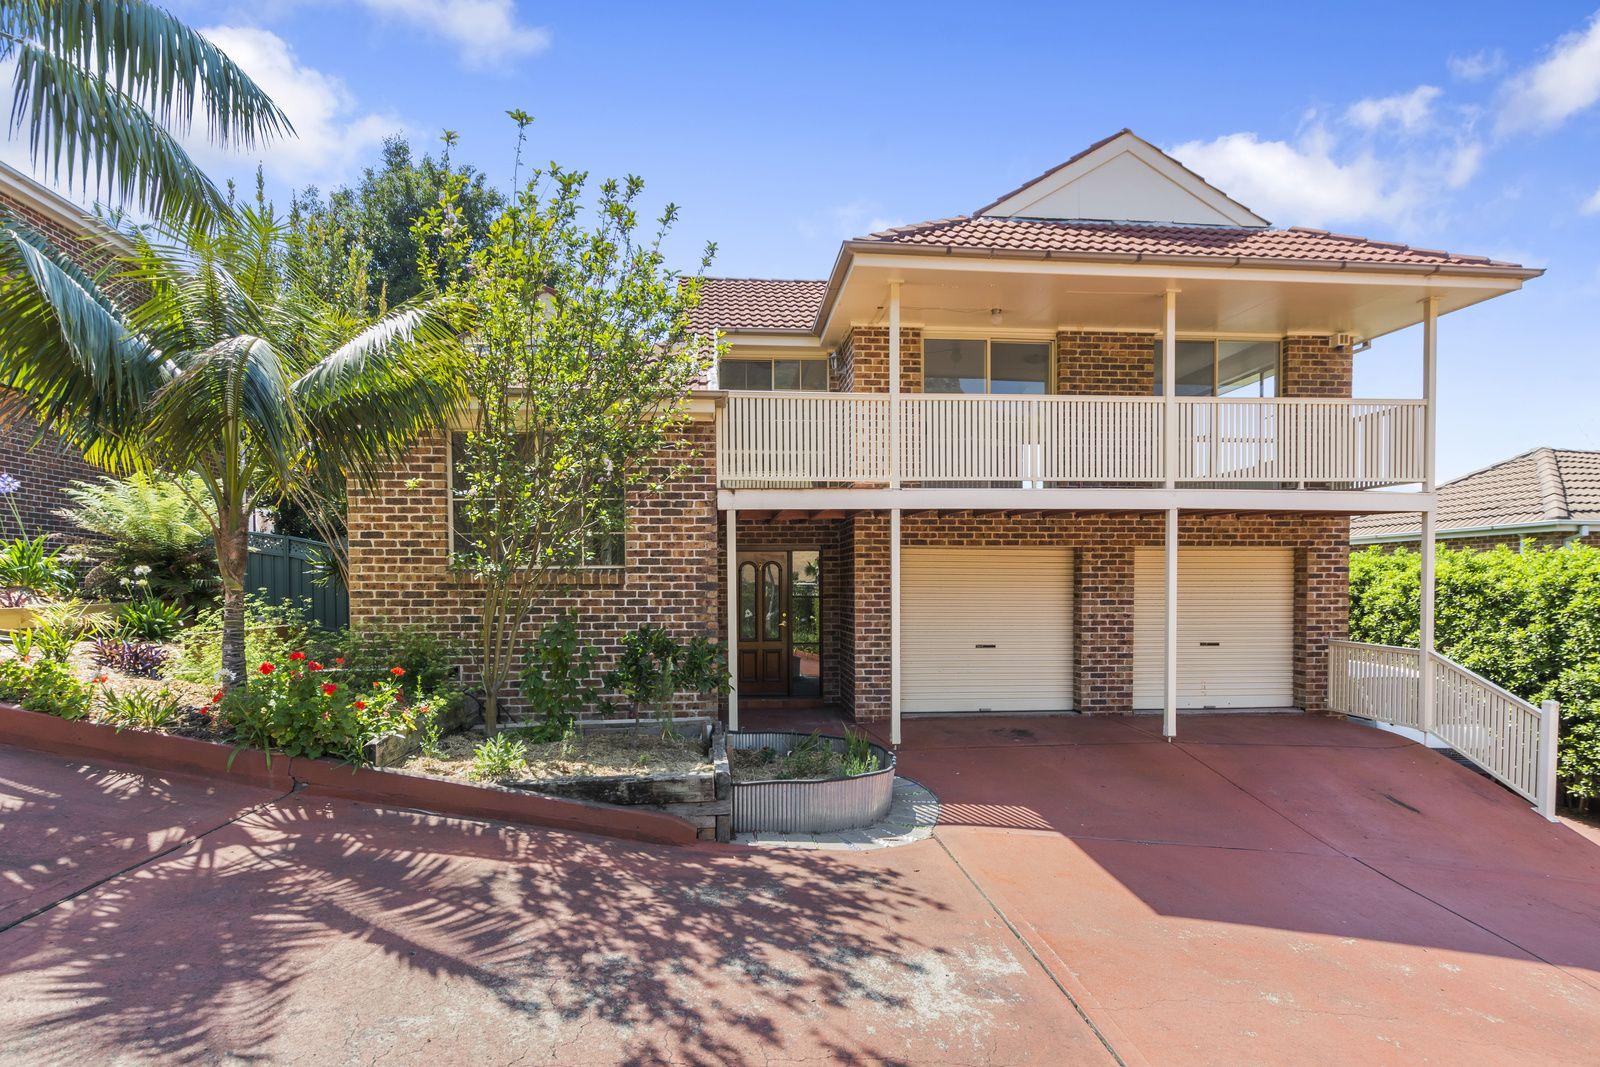 7/13 Parmenter  Avenue, Corrimal NSW 2518, Image 0